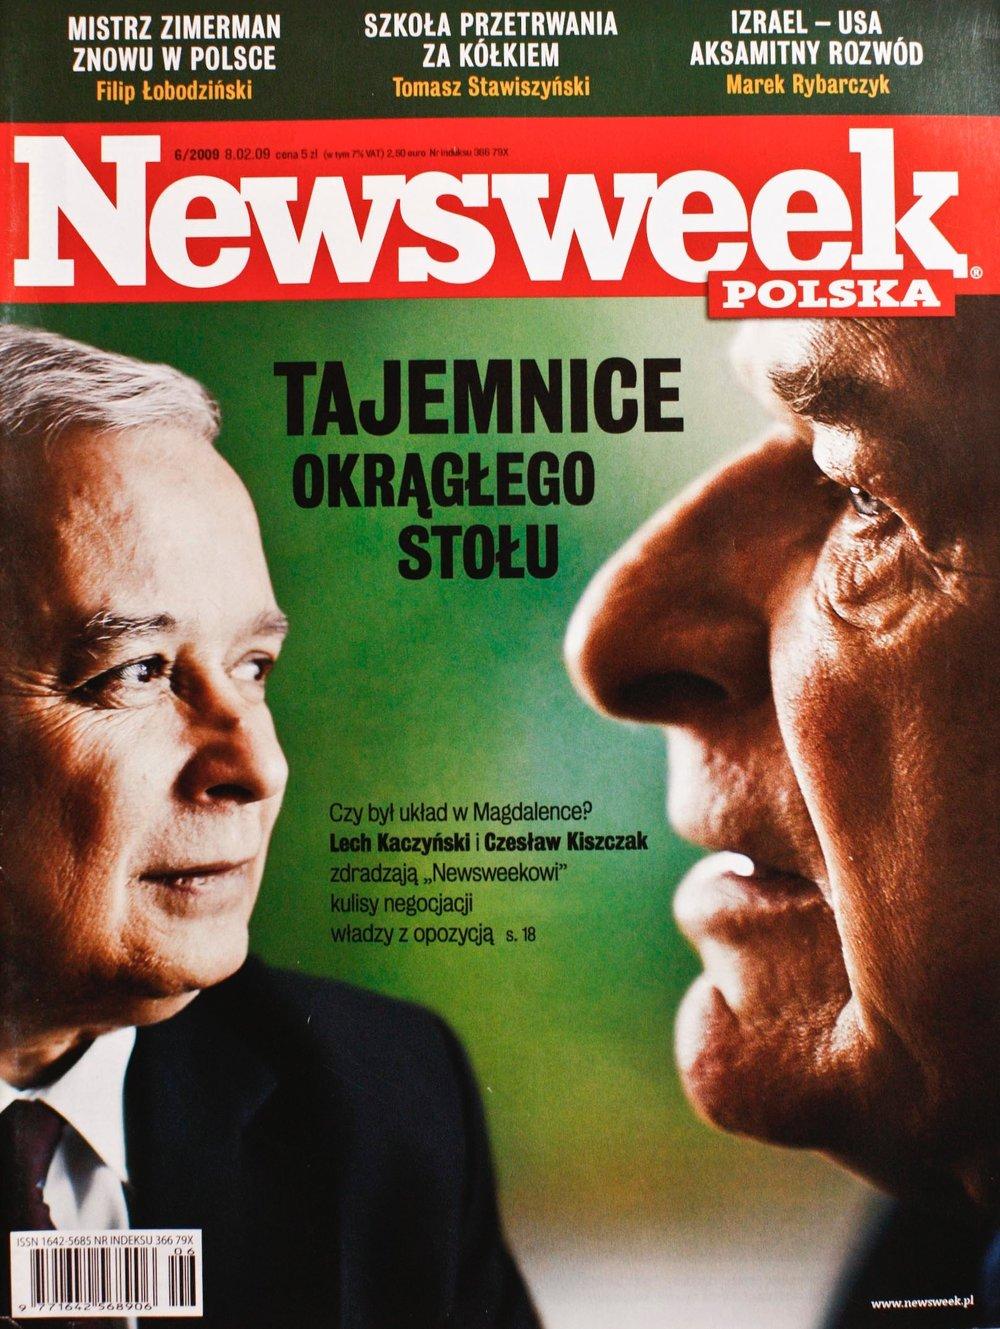 NEWSWEEK KOBIETA 6/2009